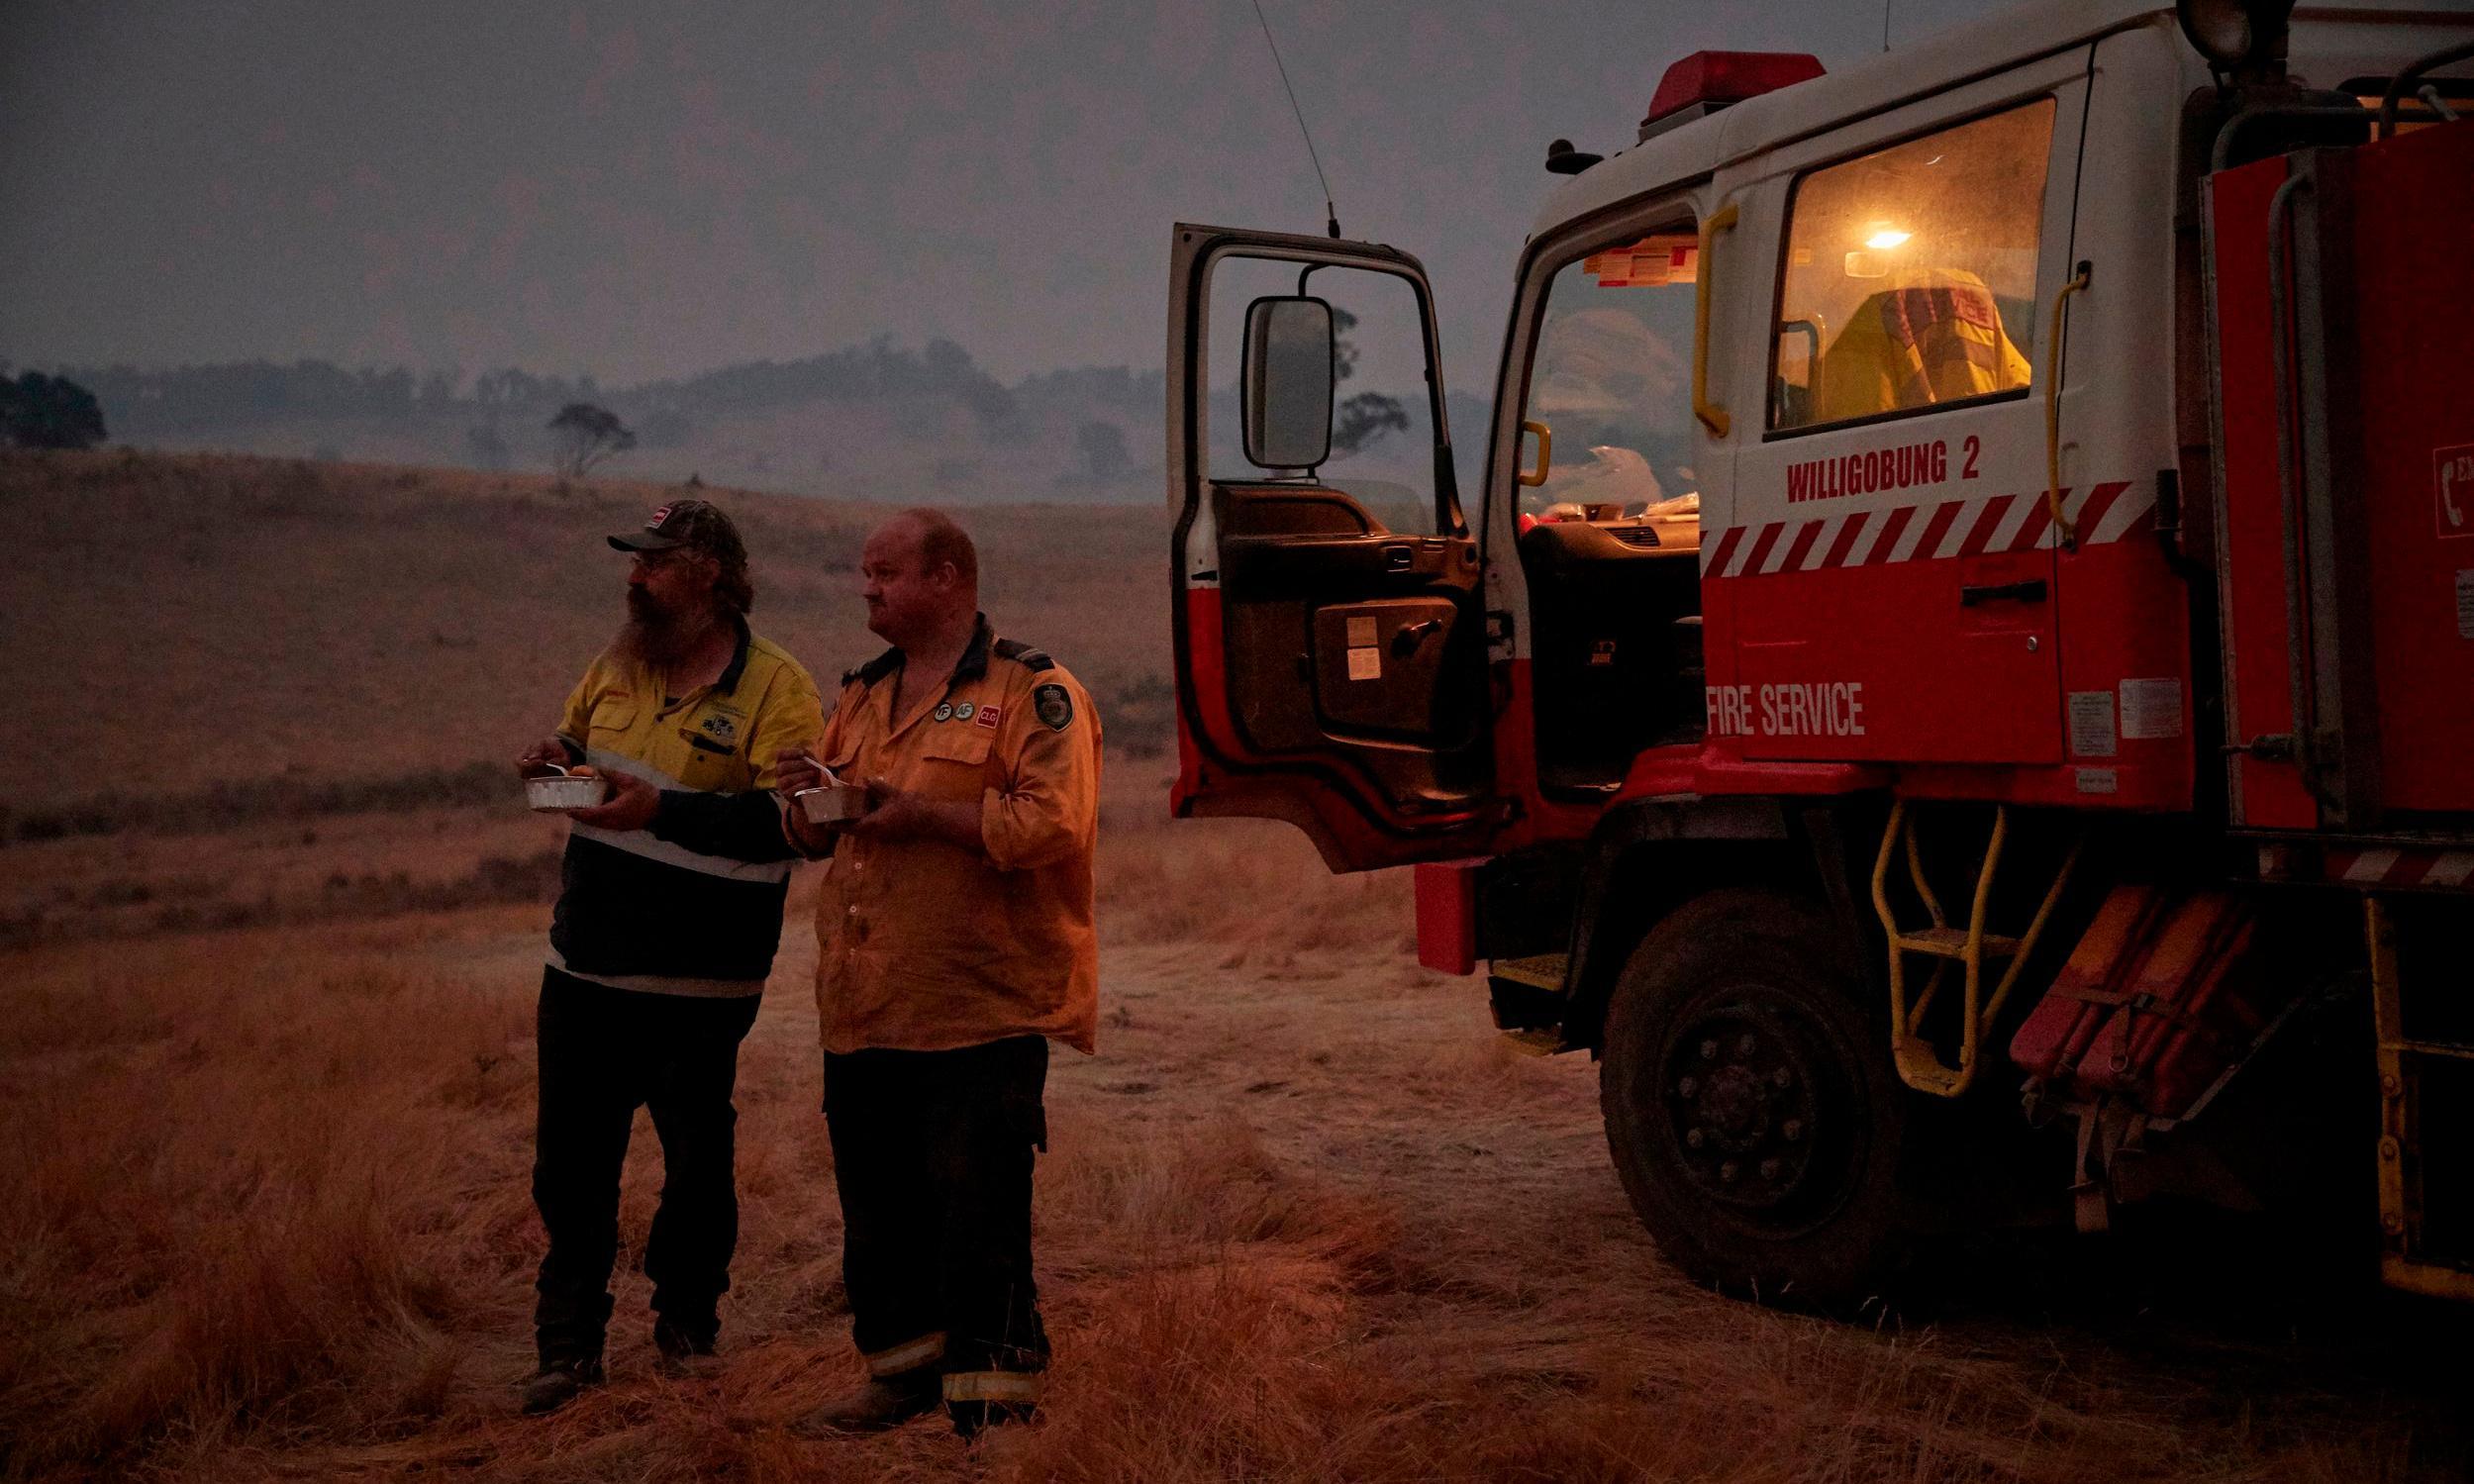 Australia's volunteer firefighting force declined 10% in past decade